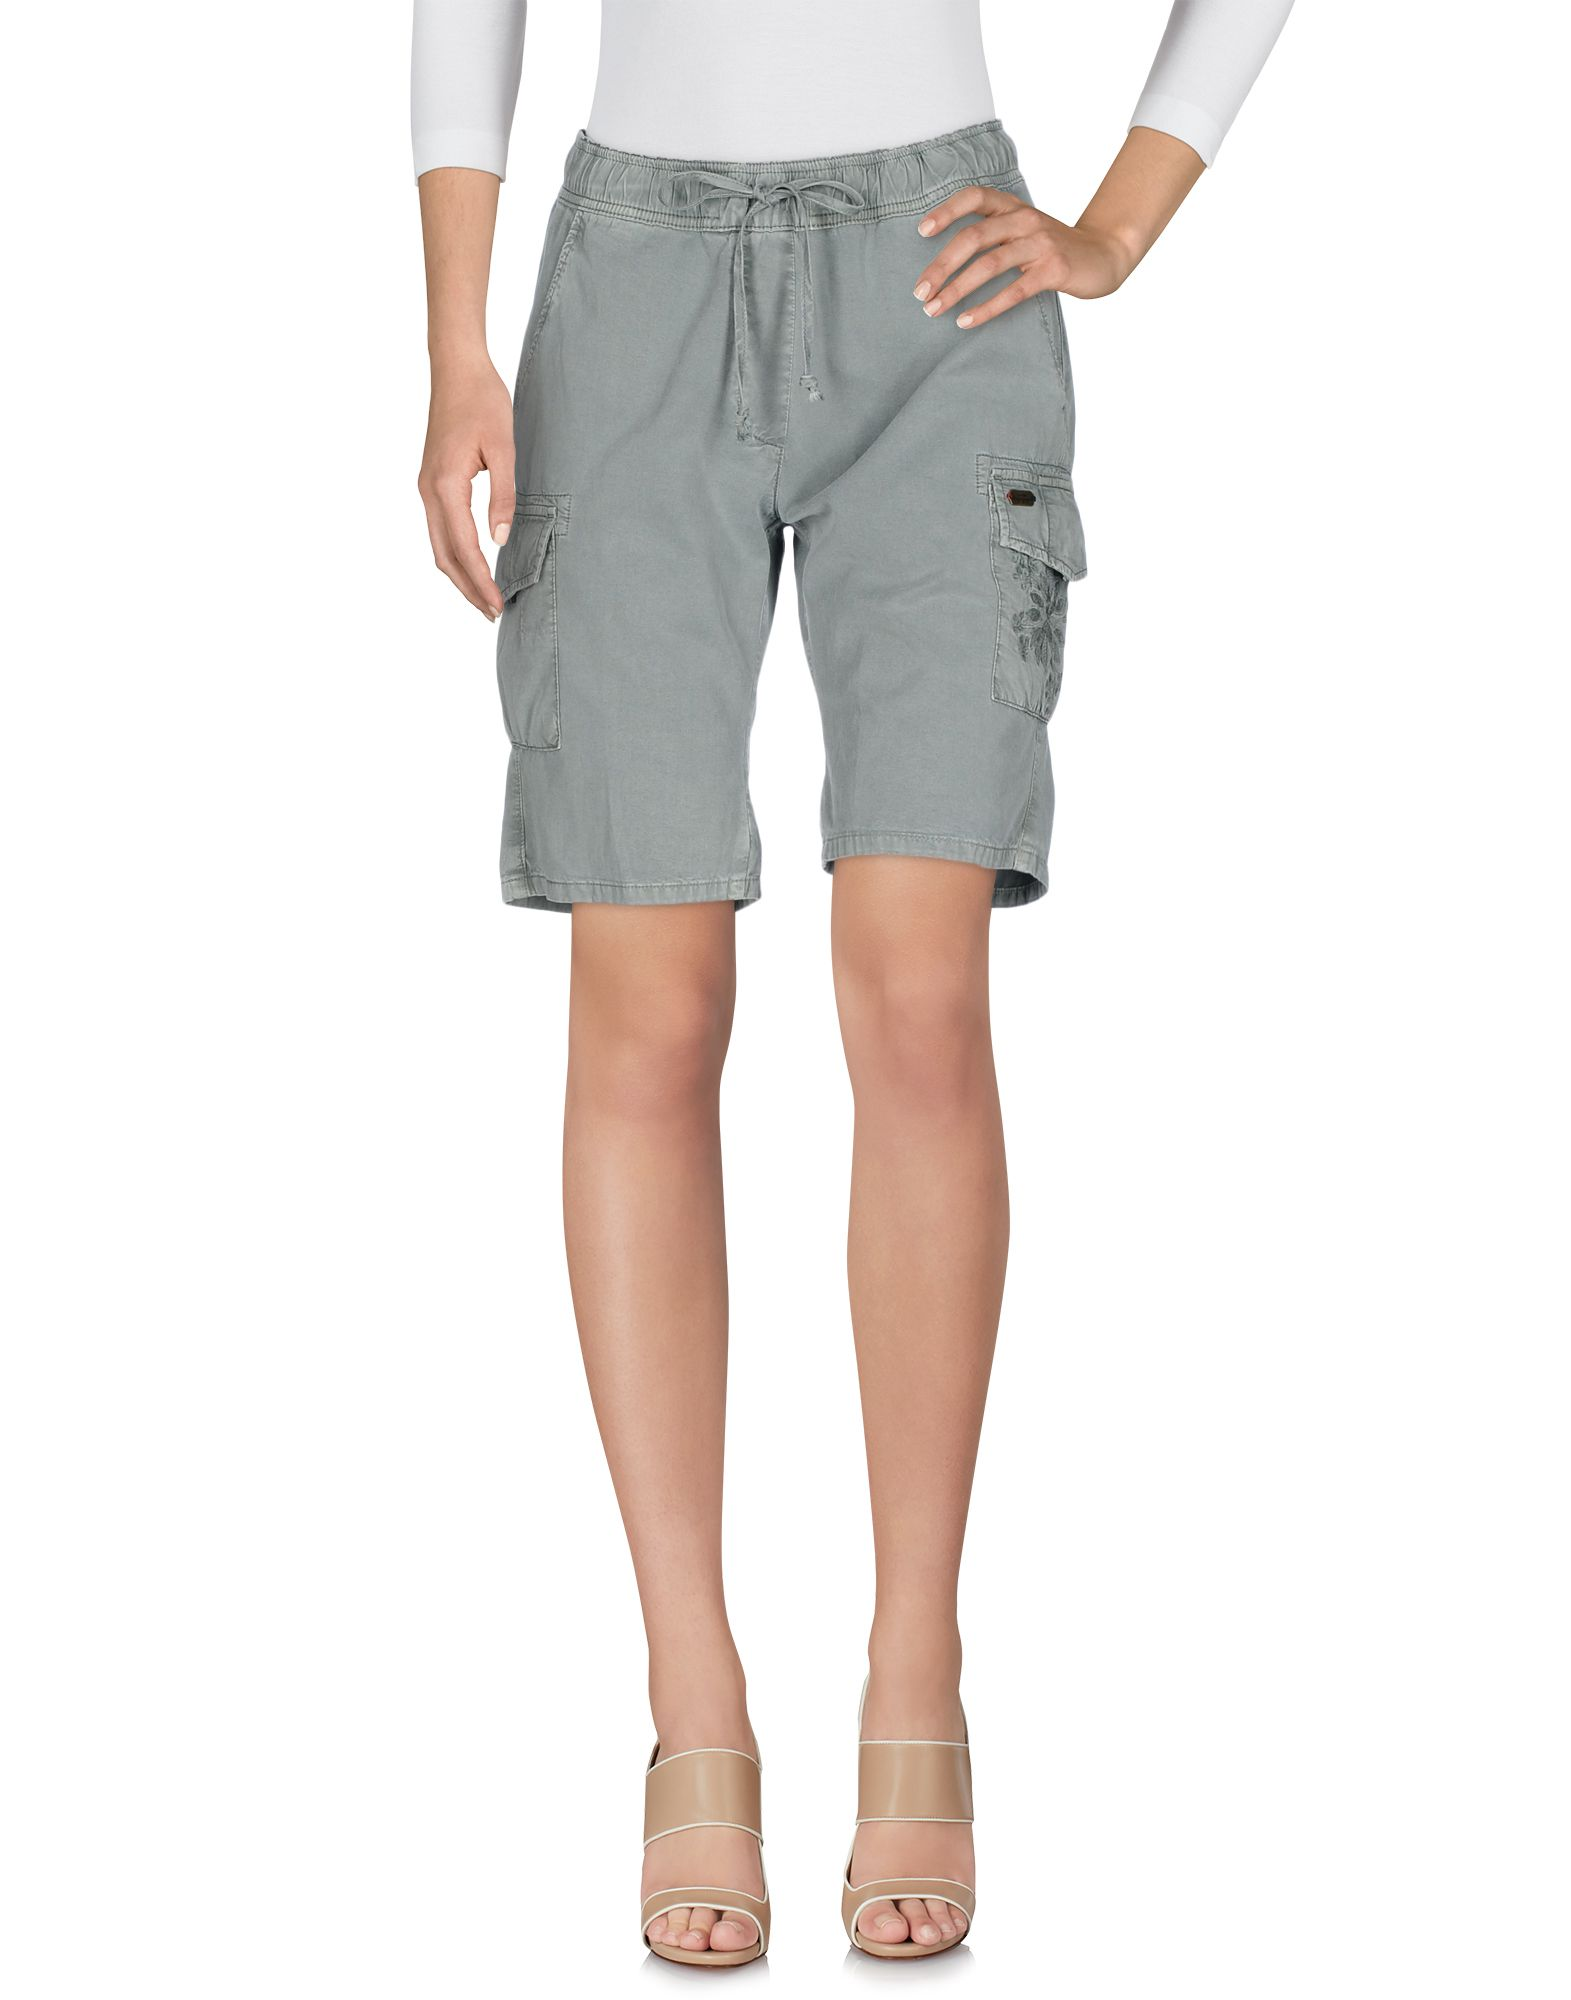 Shorts & Bermuda Napapijri Napapijri Napapijri donna - 13128599WN f74